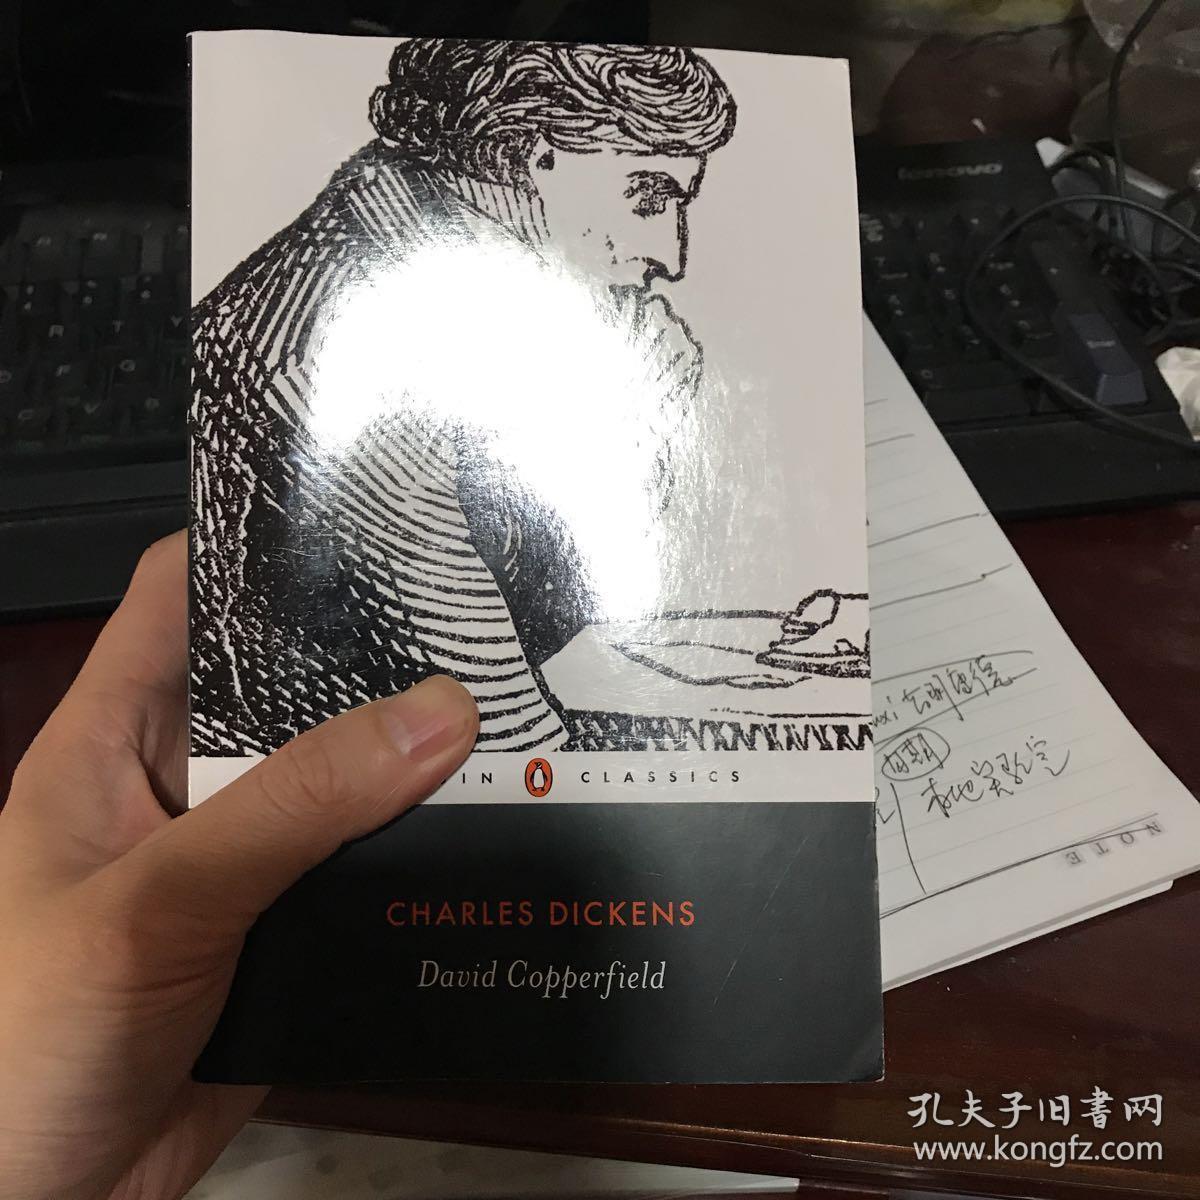 David Copperfield:Personal History of David Copperfield: The Personal History of David Copperfield (Penguin Classics)